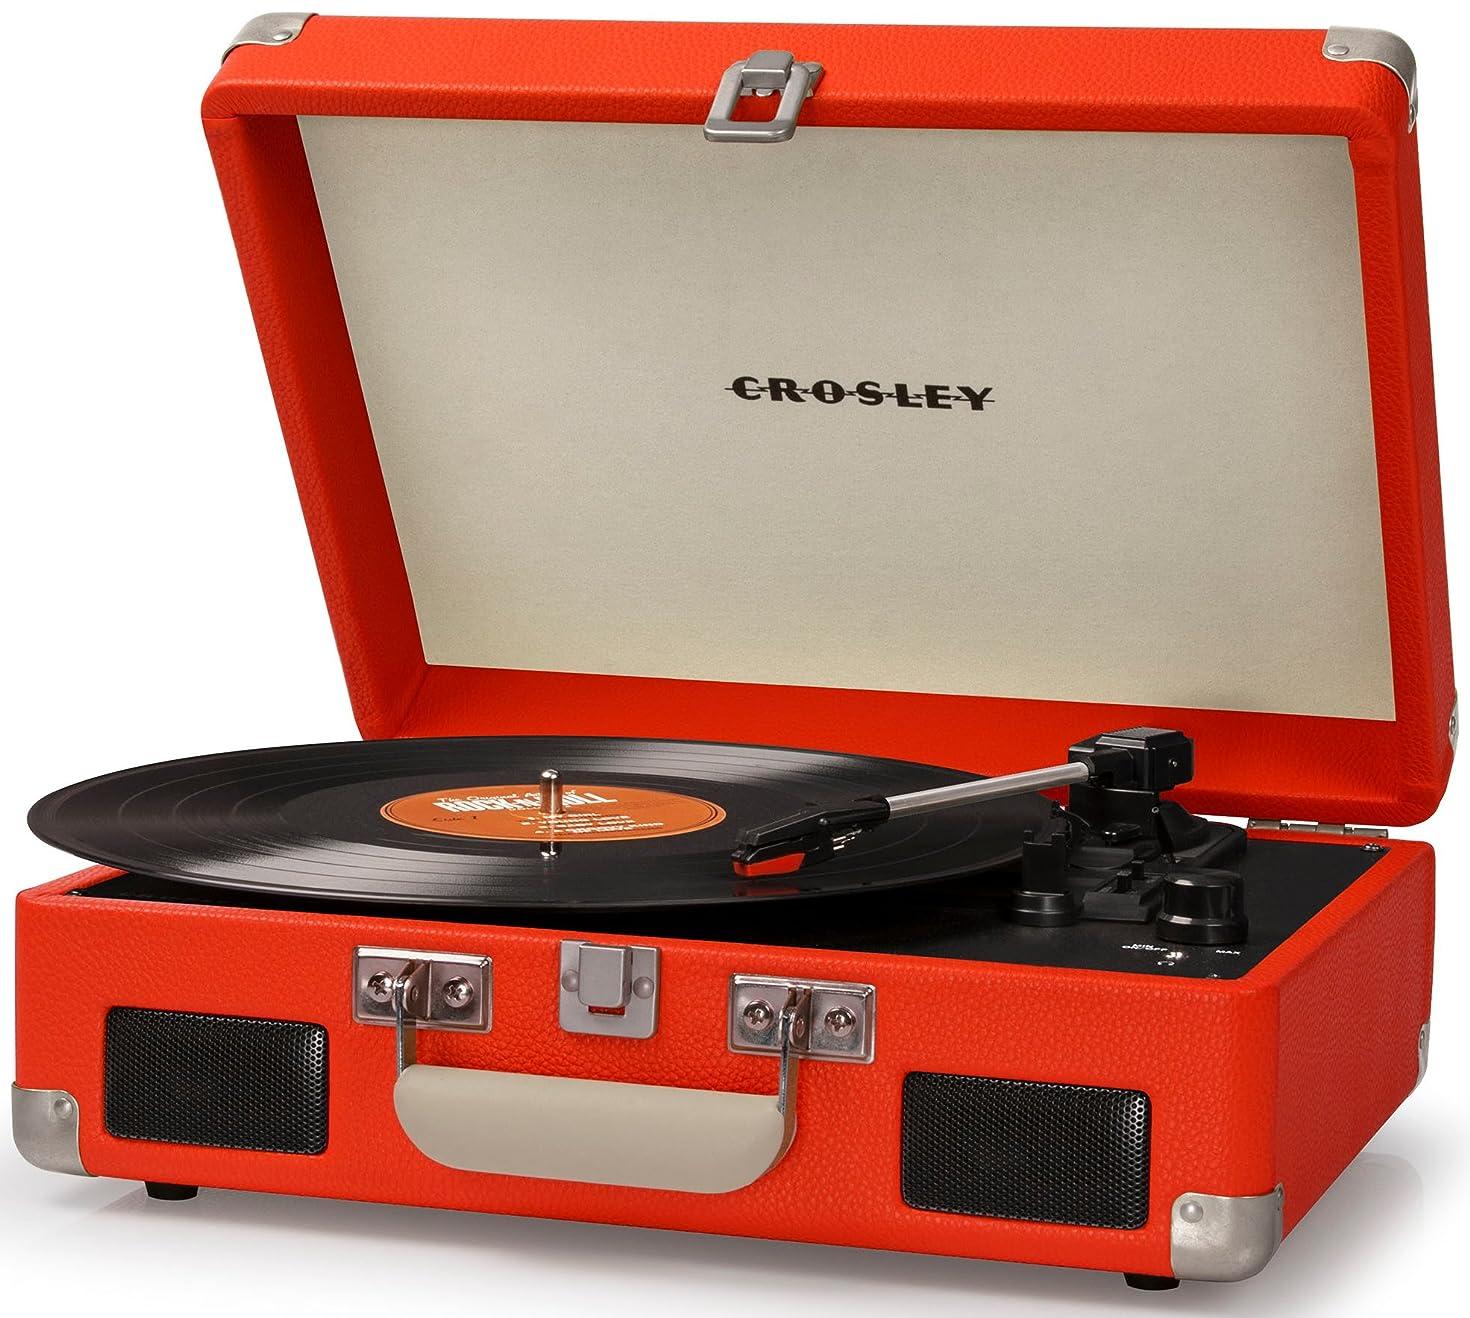 Crosley CR8005C-OR Cruiser II Portable Battery Powered 3-Speed Turntable, Orange